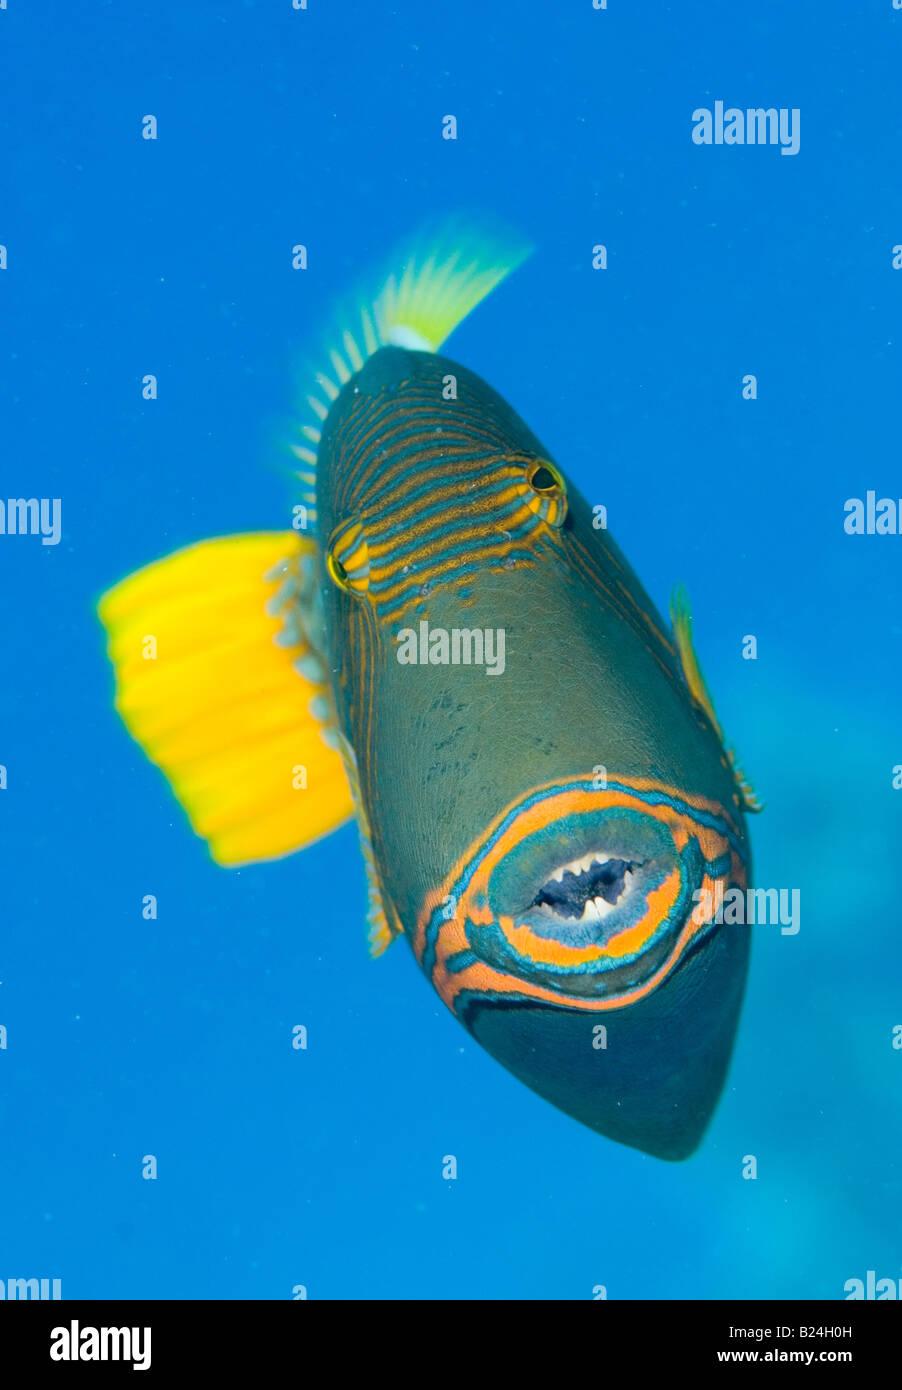 Trigger fish portrait. - Stock Image